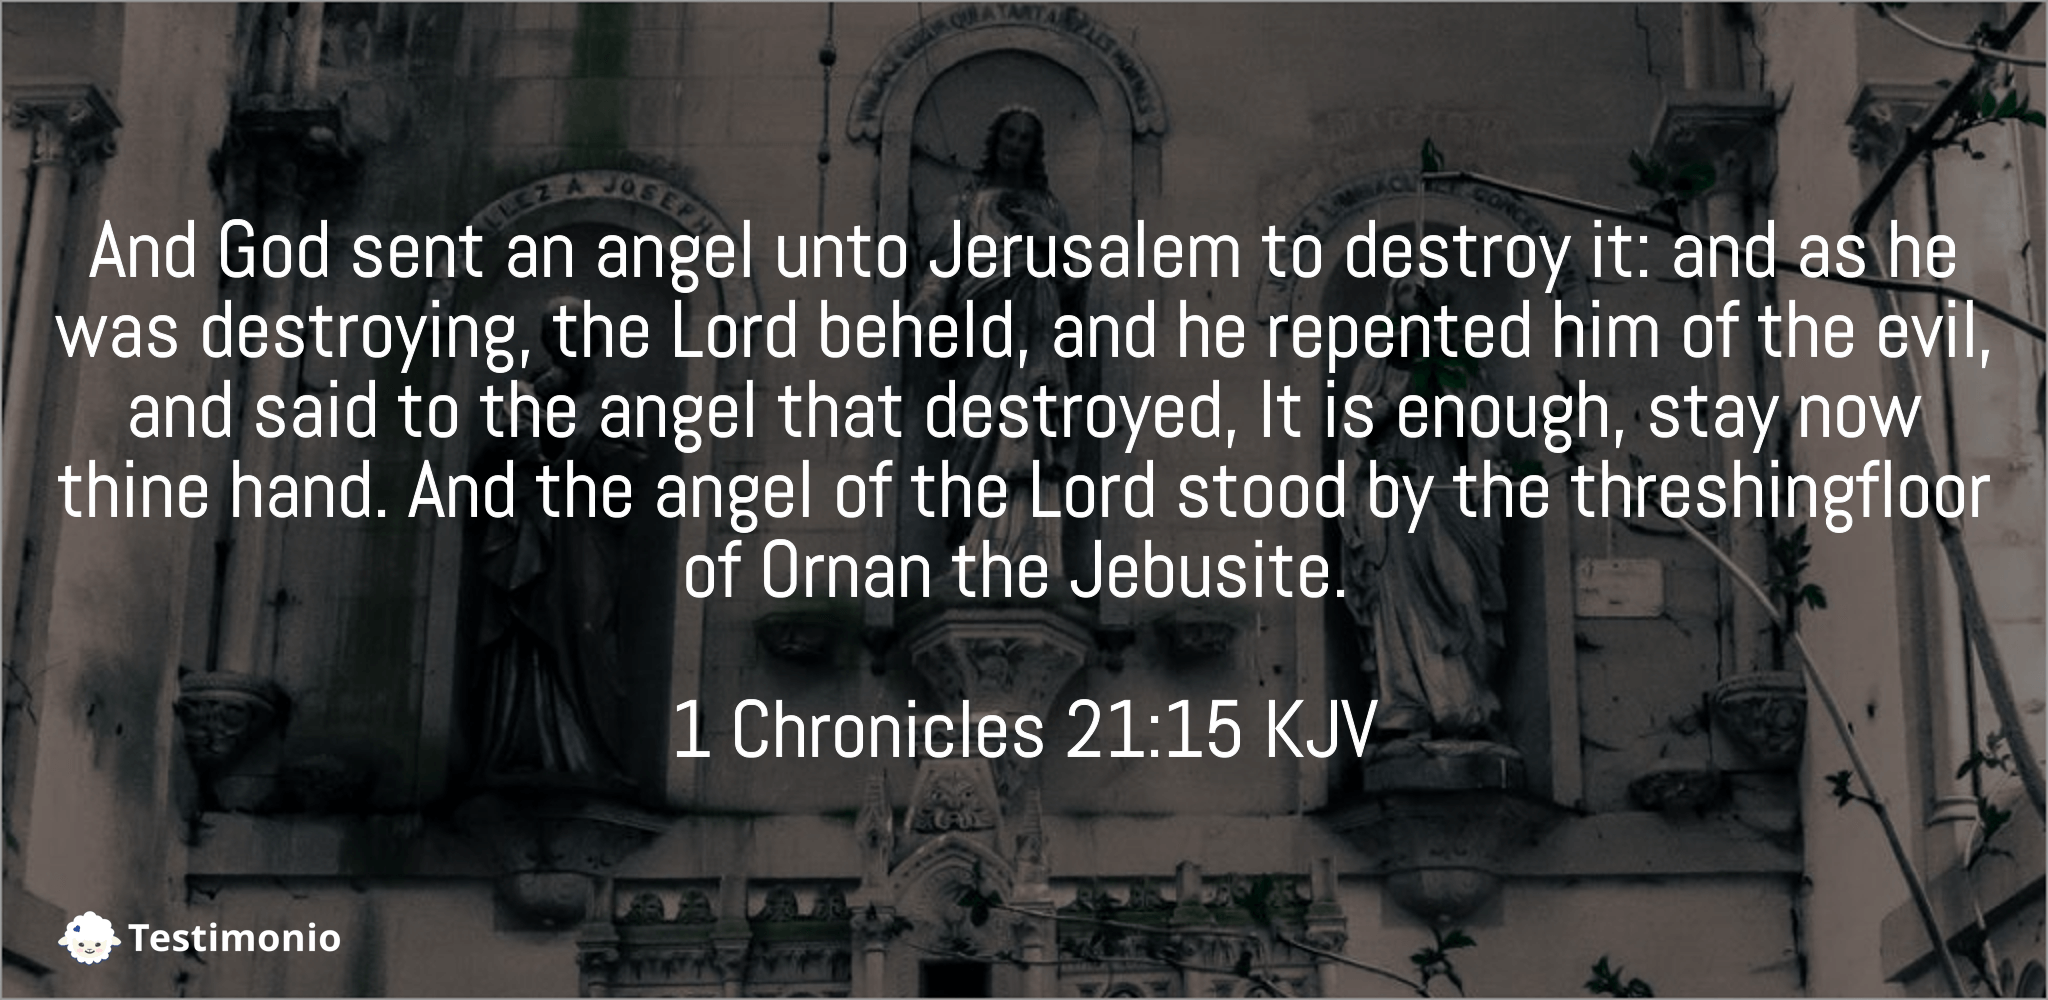 1 Chronicles 21:15